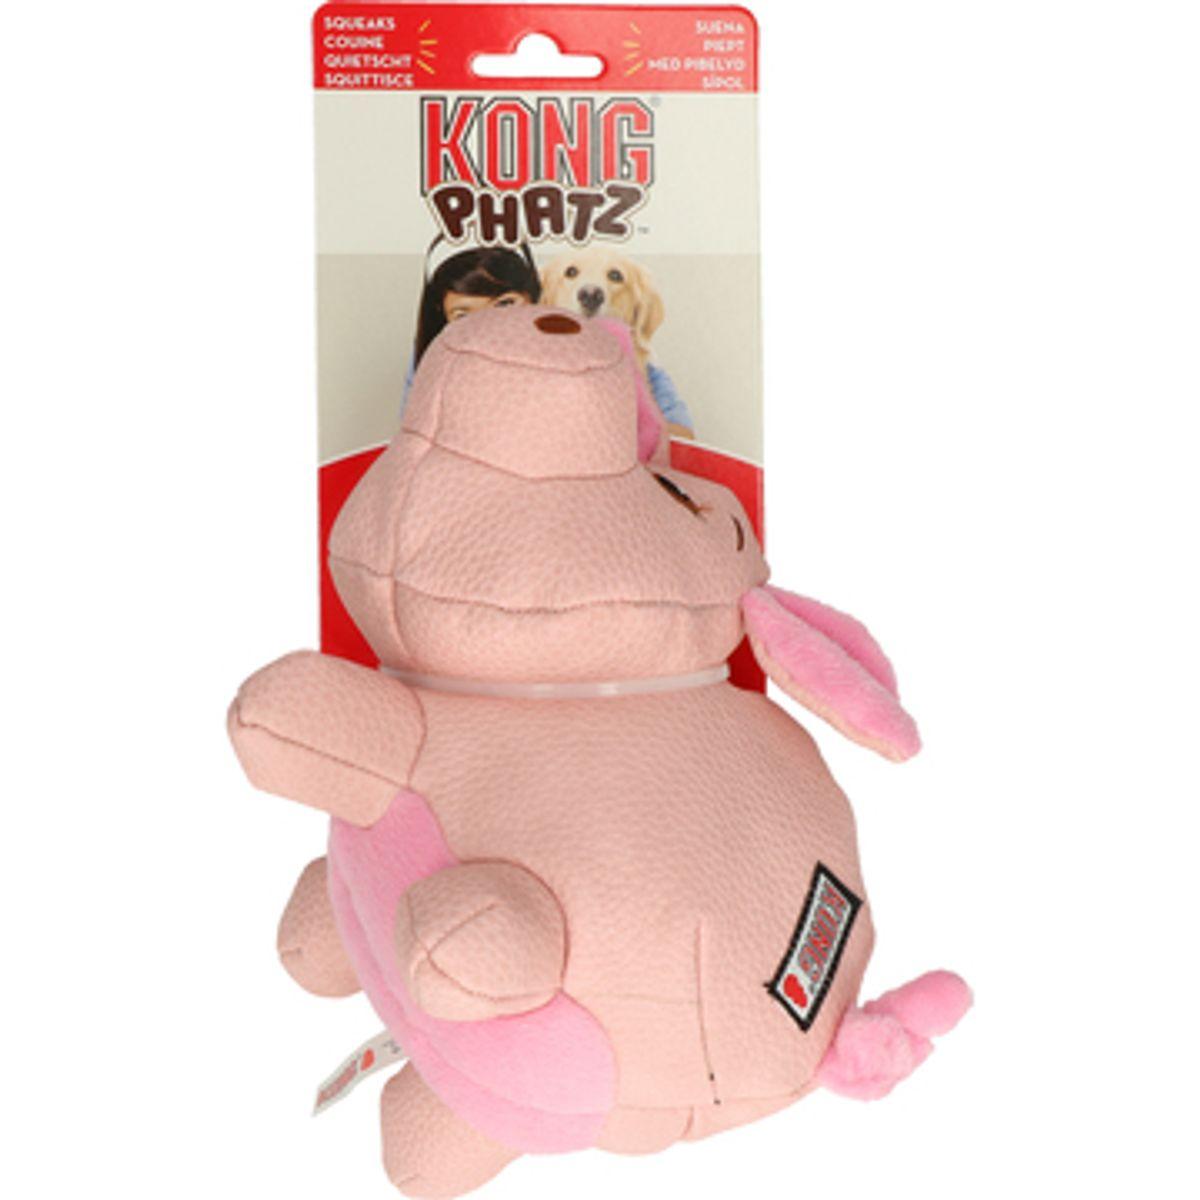 KONG Leksak Phatz Pig S 12cm